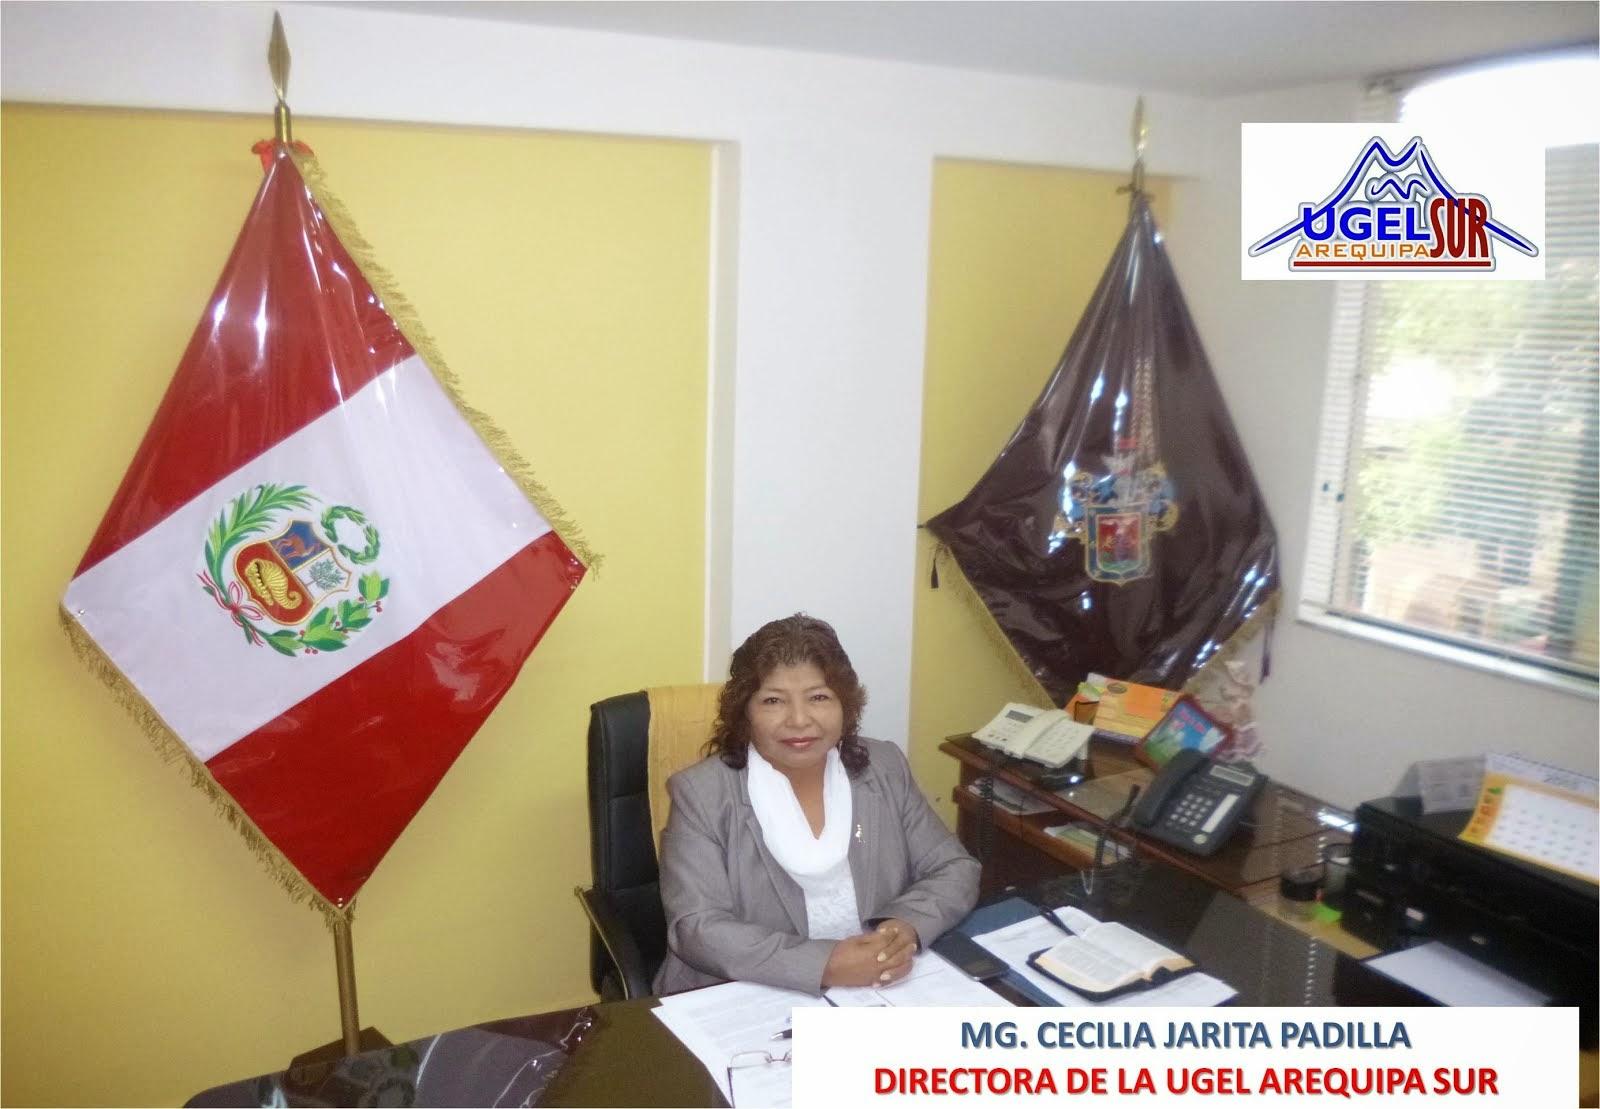 MG. CECILIA JARITA PADILLA